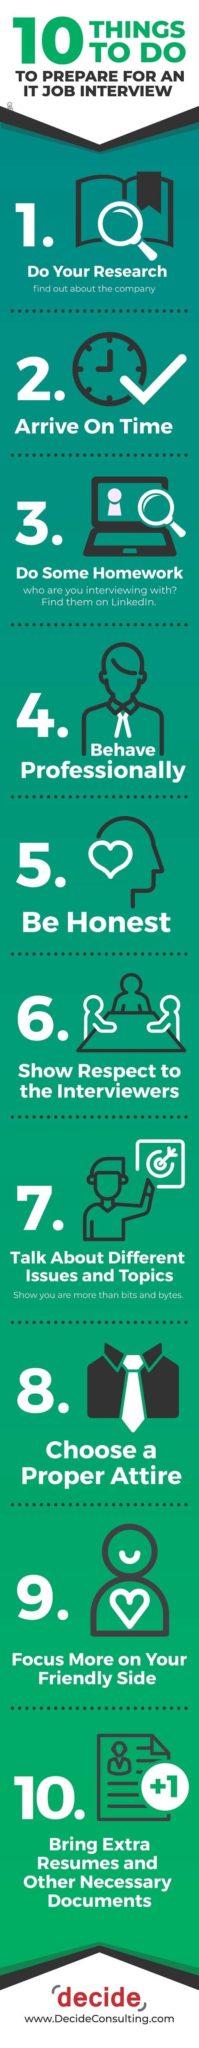 infographic prepare IT interview